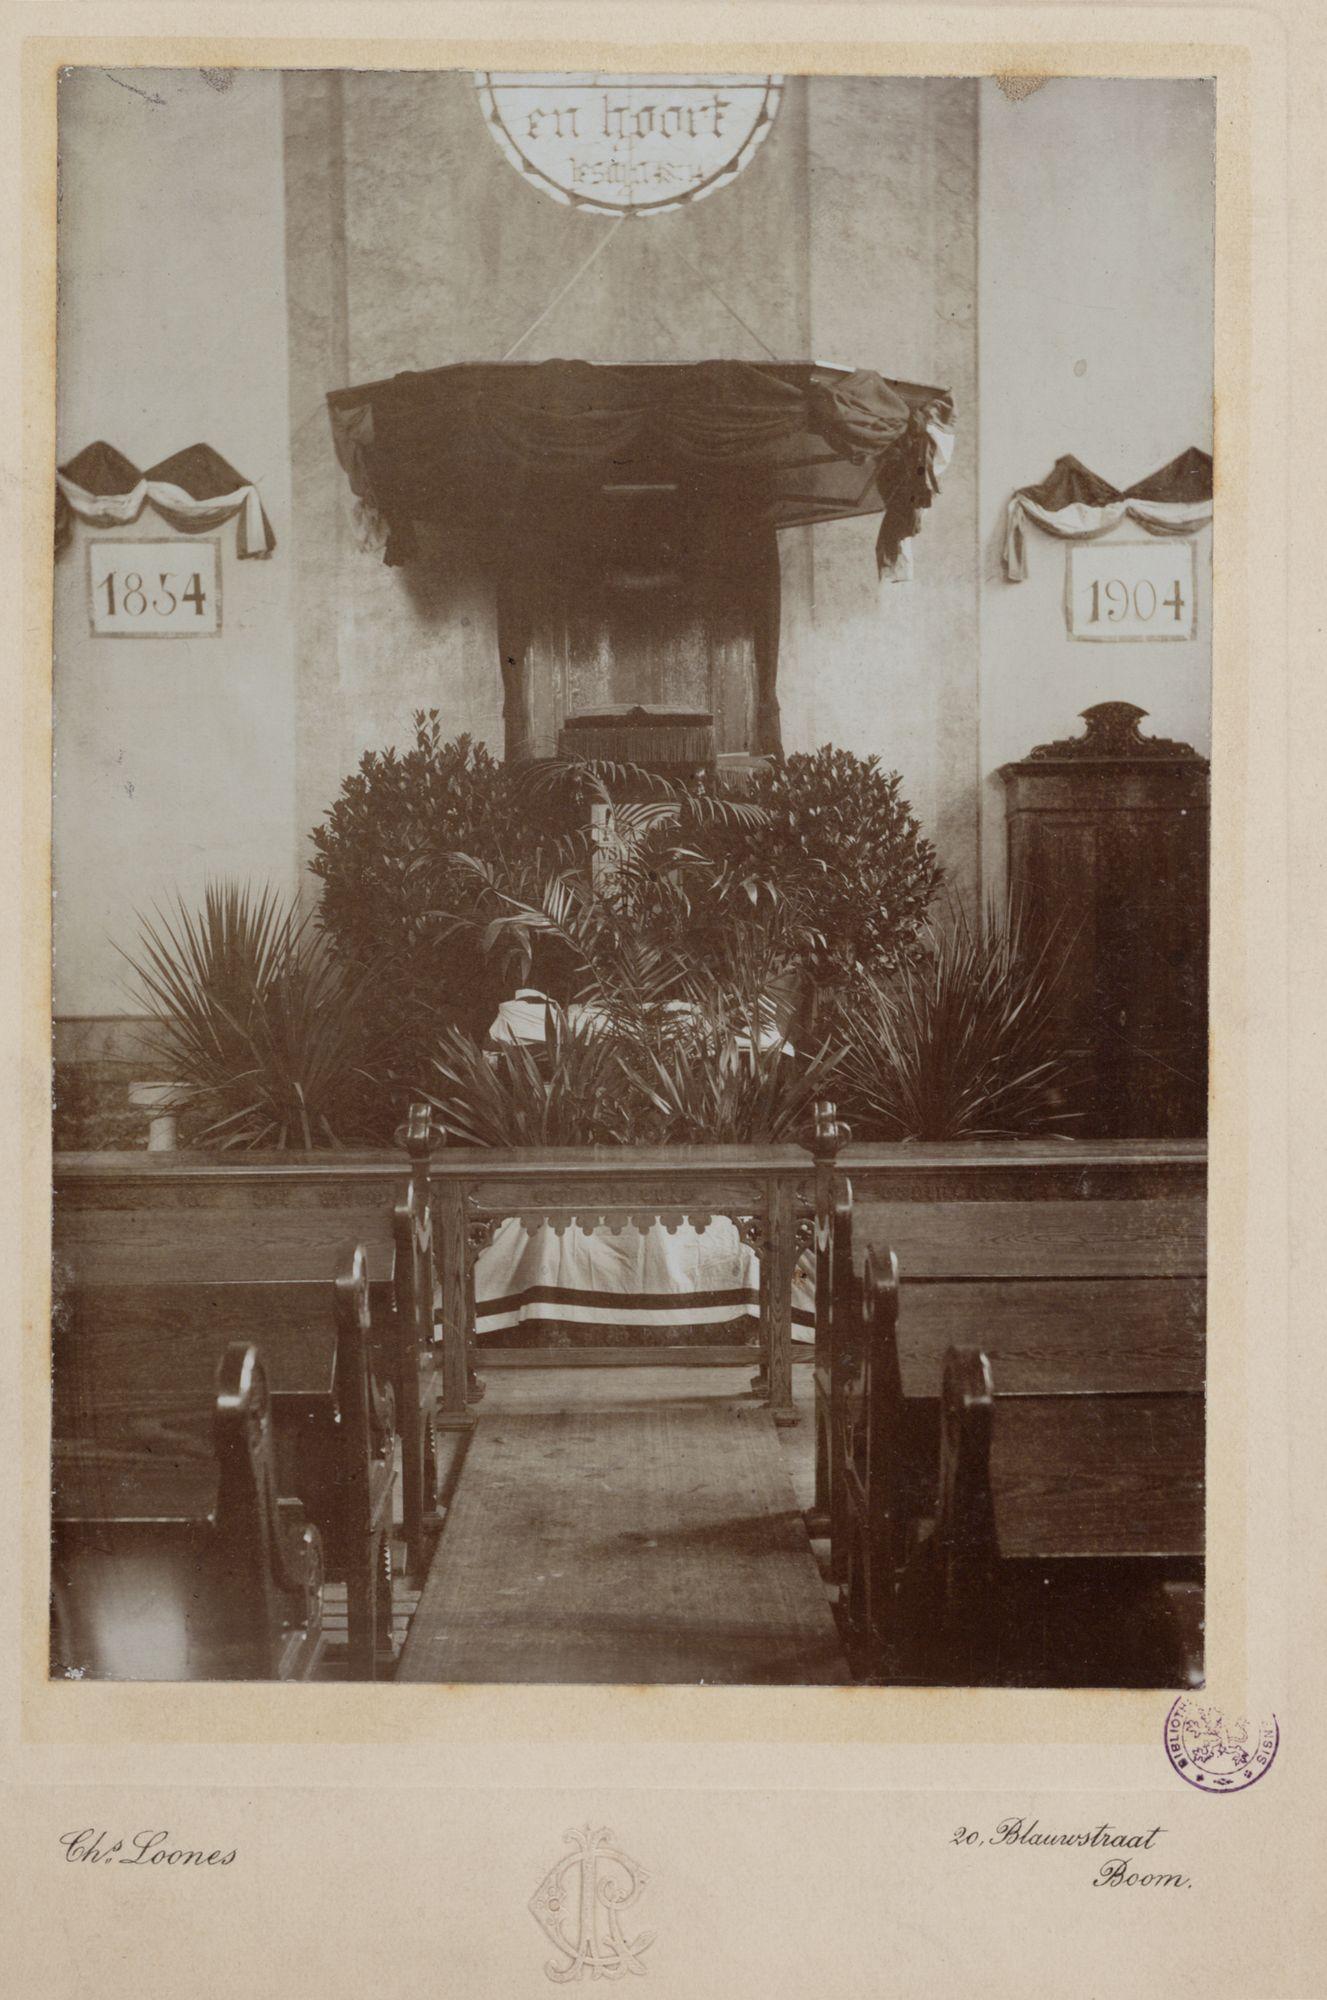 Gent: Begijnhoflaan: Protestantse kerk: versierde preekstoel, 1904